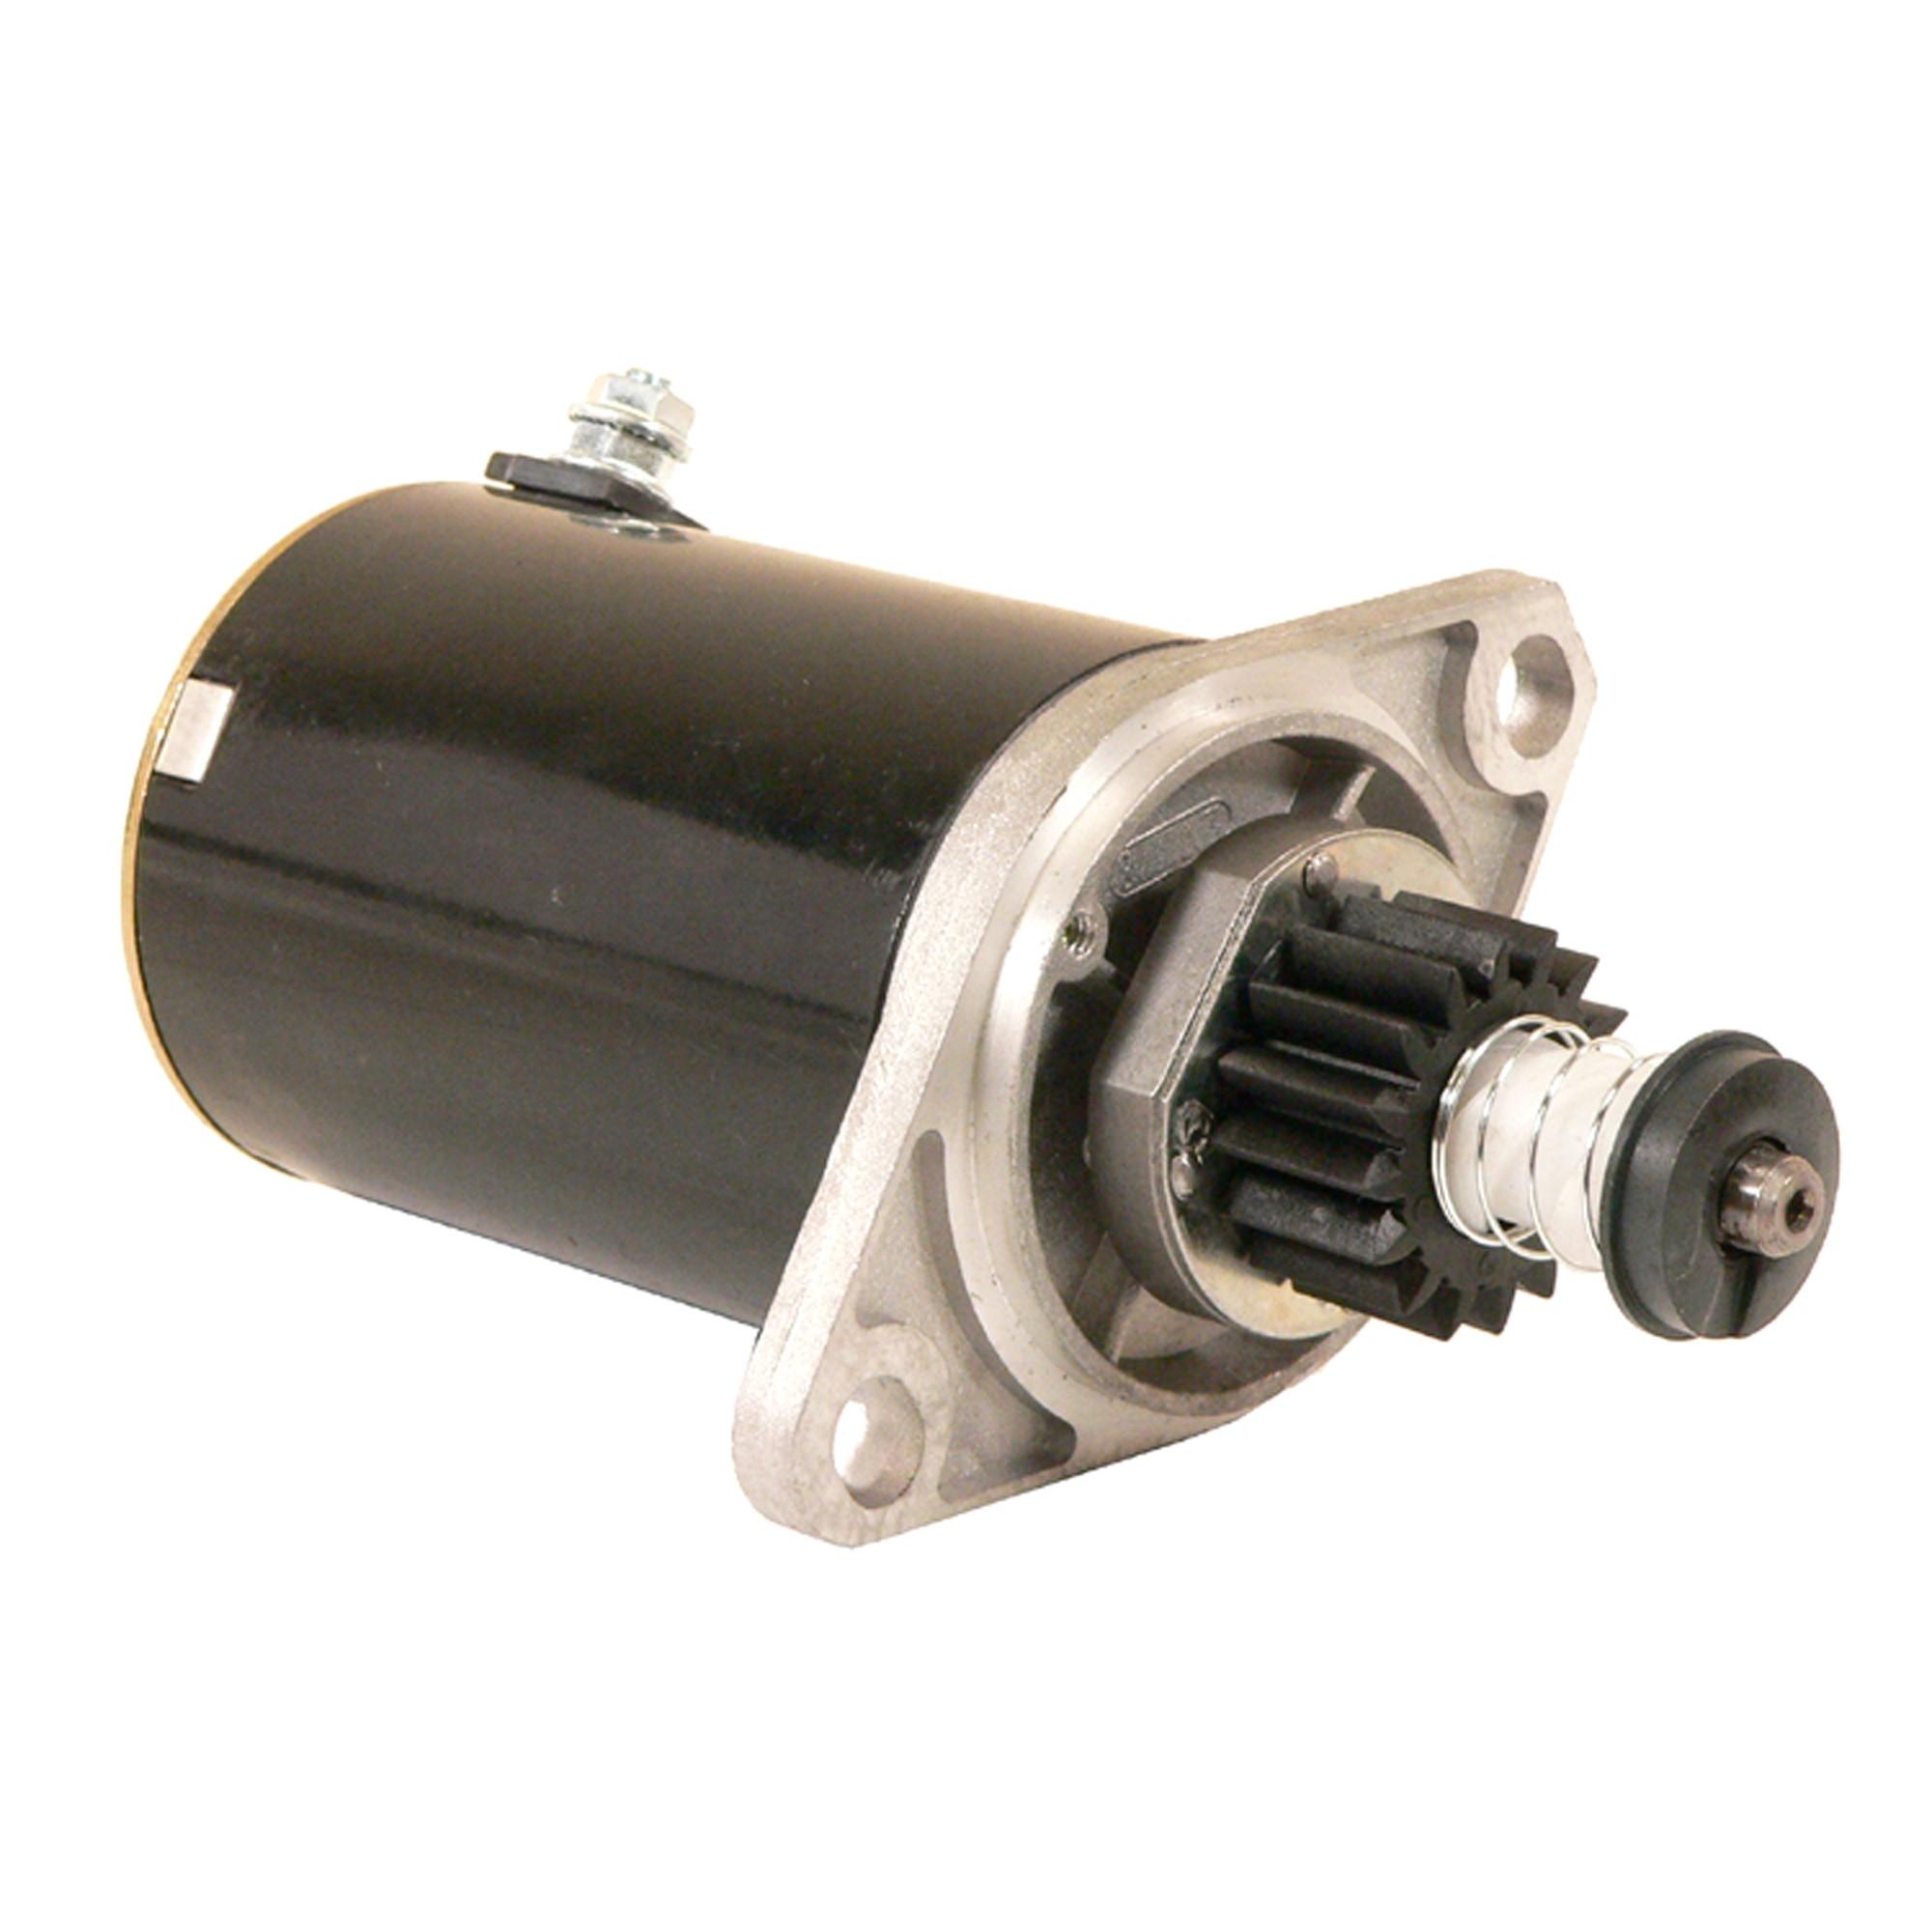 Marine NEW Starter Onan Engines NHM RV Genset